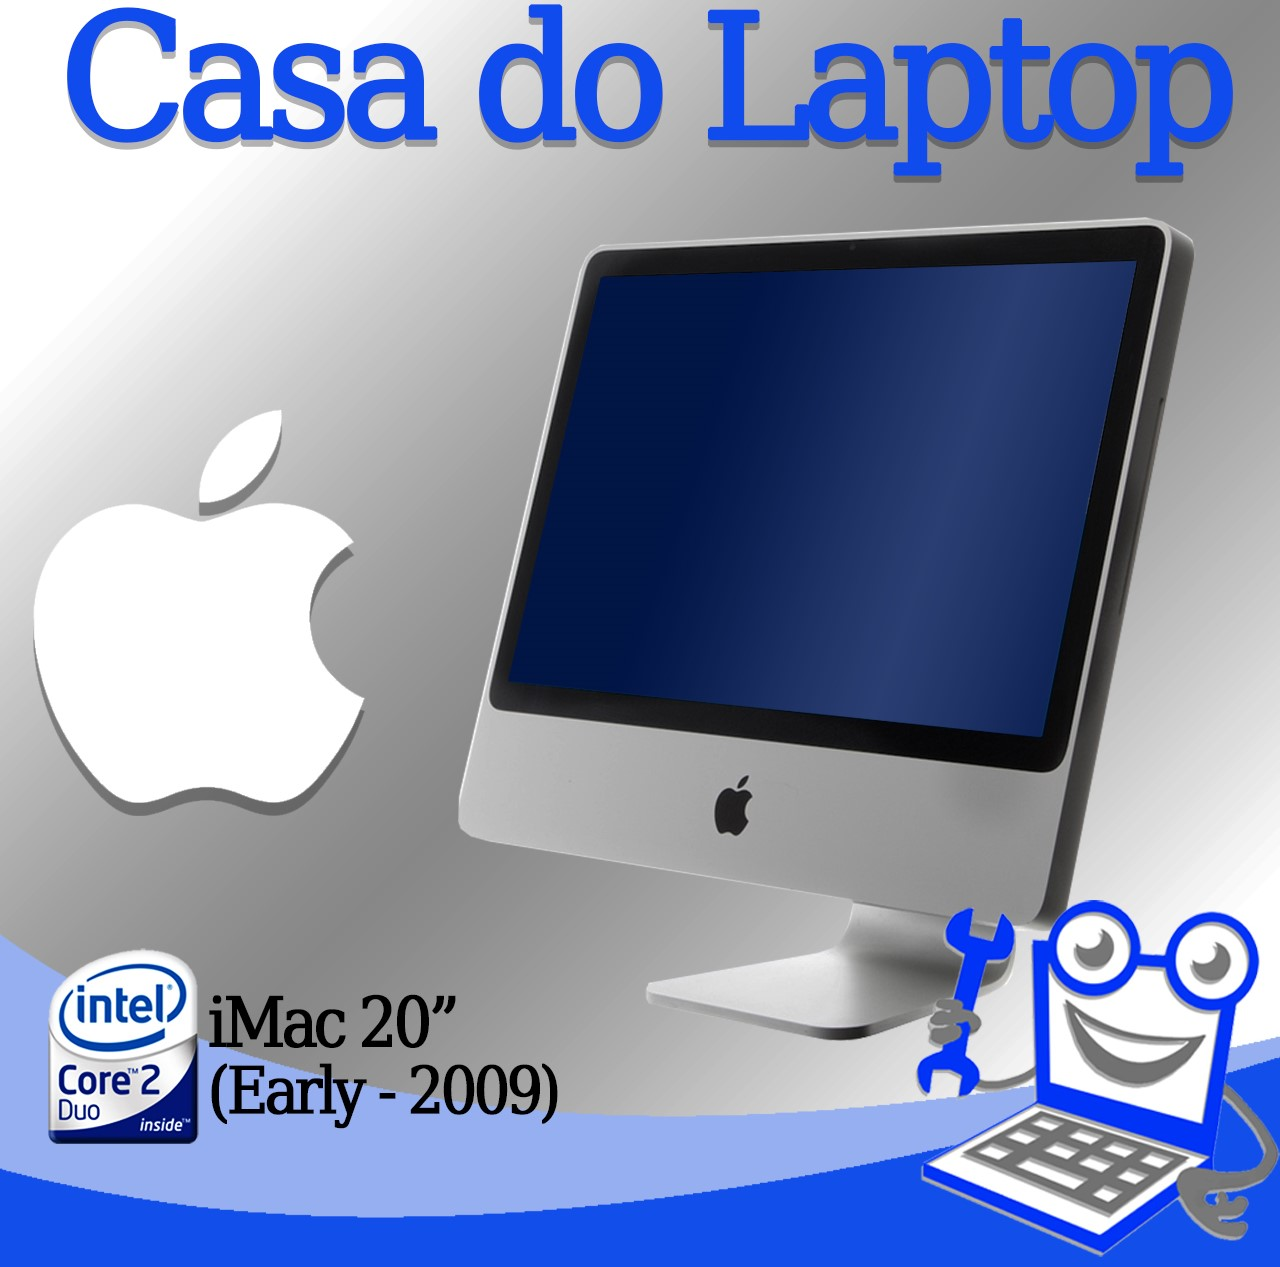 All in One  Apple iMac Intel Core 2 Duo 4GB de memória RAM e 250GB disco 120MB vídeo dedicado RADEON 2400 XT